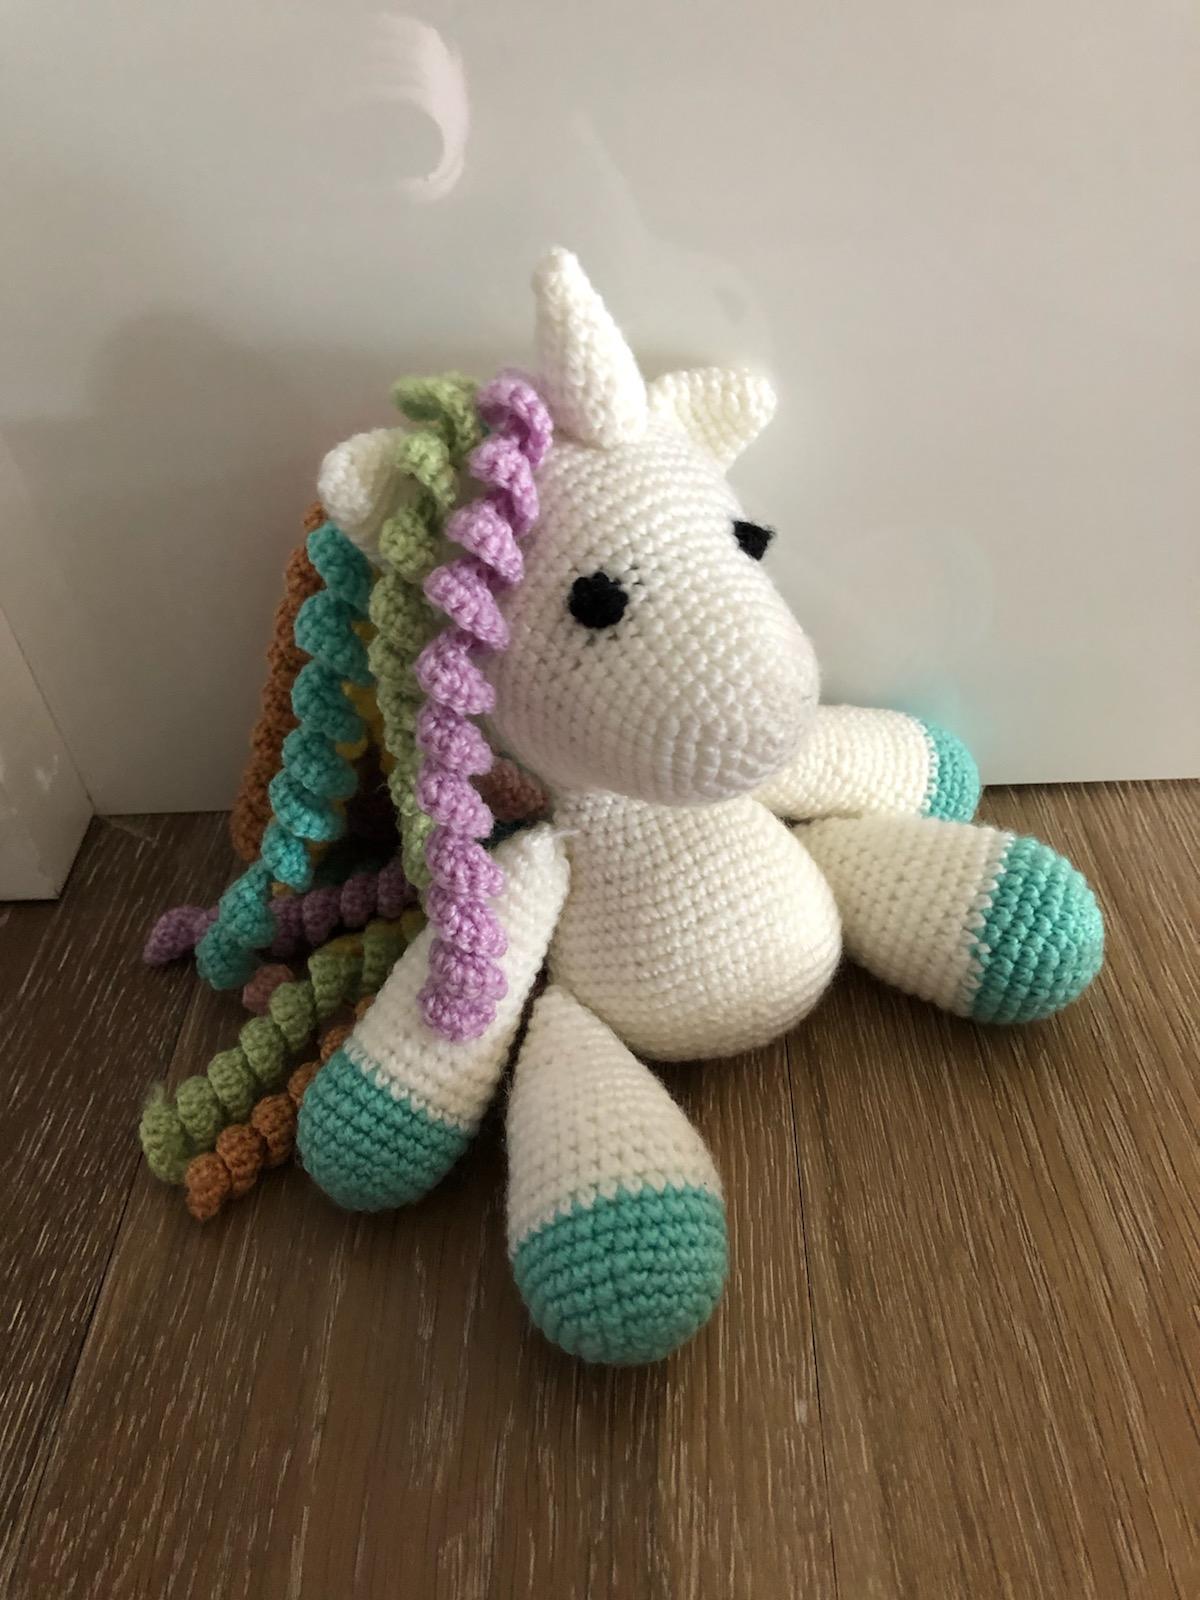 Shy unicorn amigurumi pattern - Amigurumi Today | 1600x1200